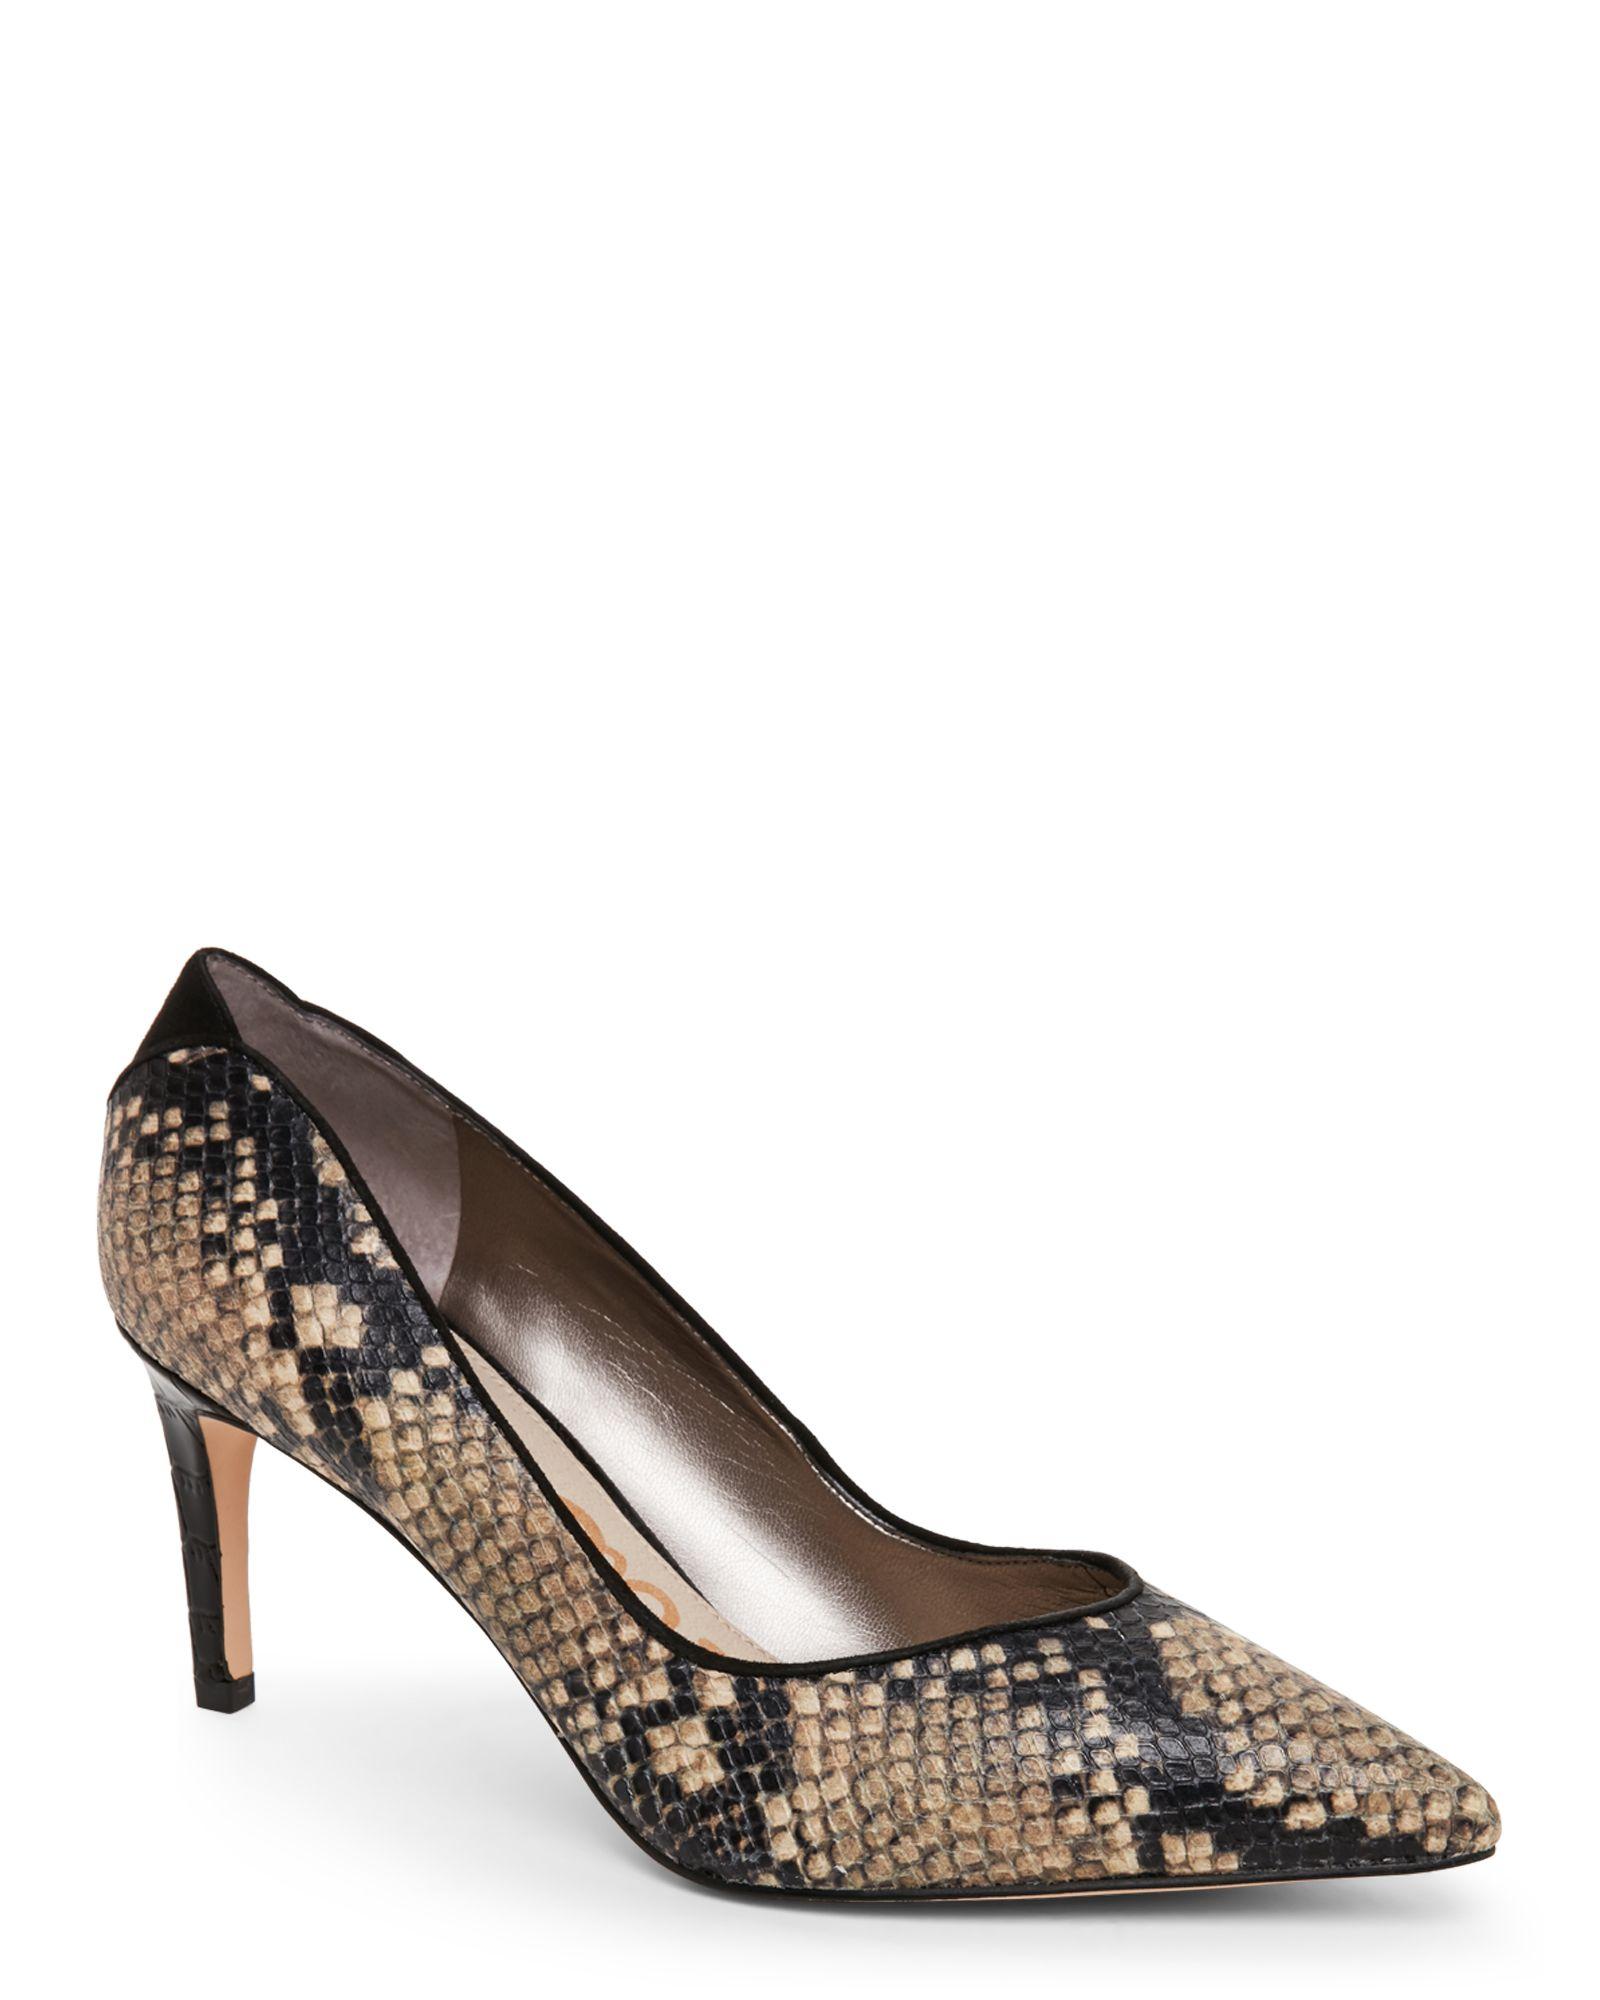 562d7e17d6864 Sam Edelman Natural Snake Orella Pointed Toe High Heel Pumps ...